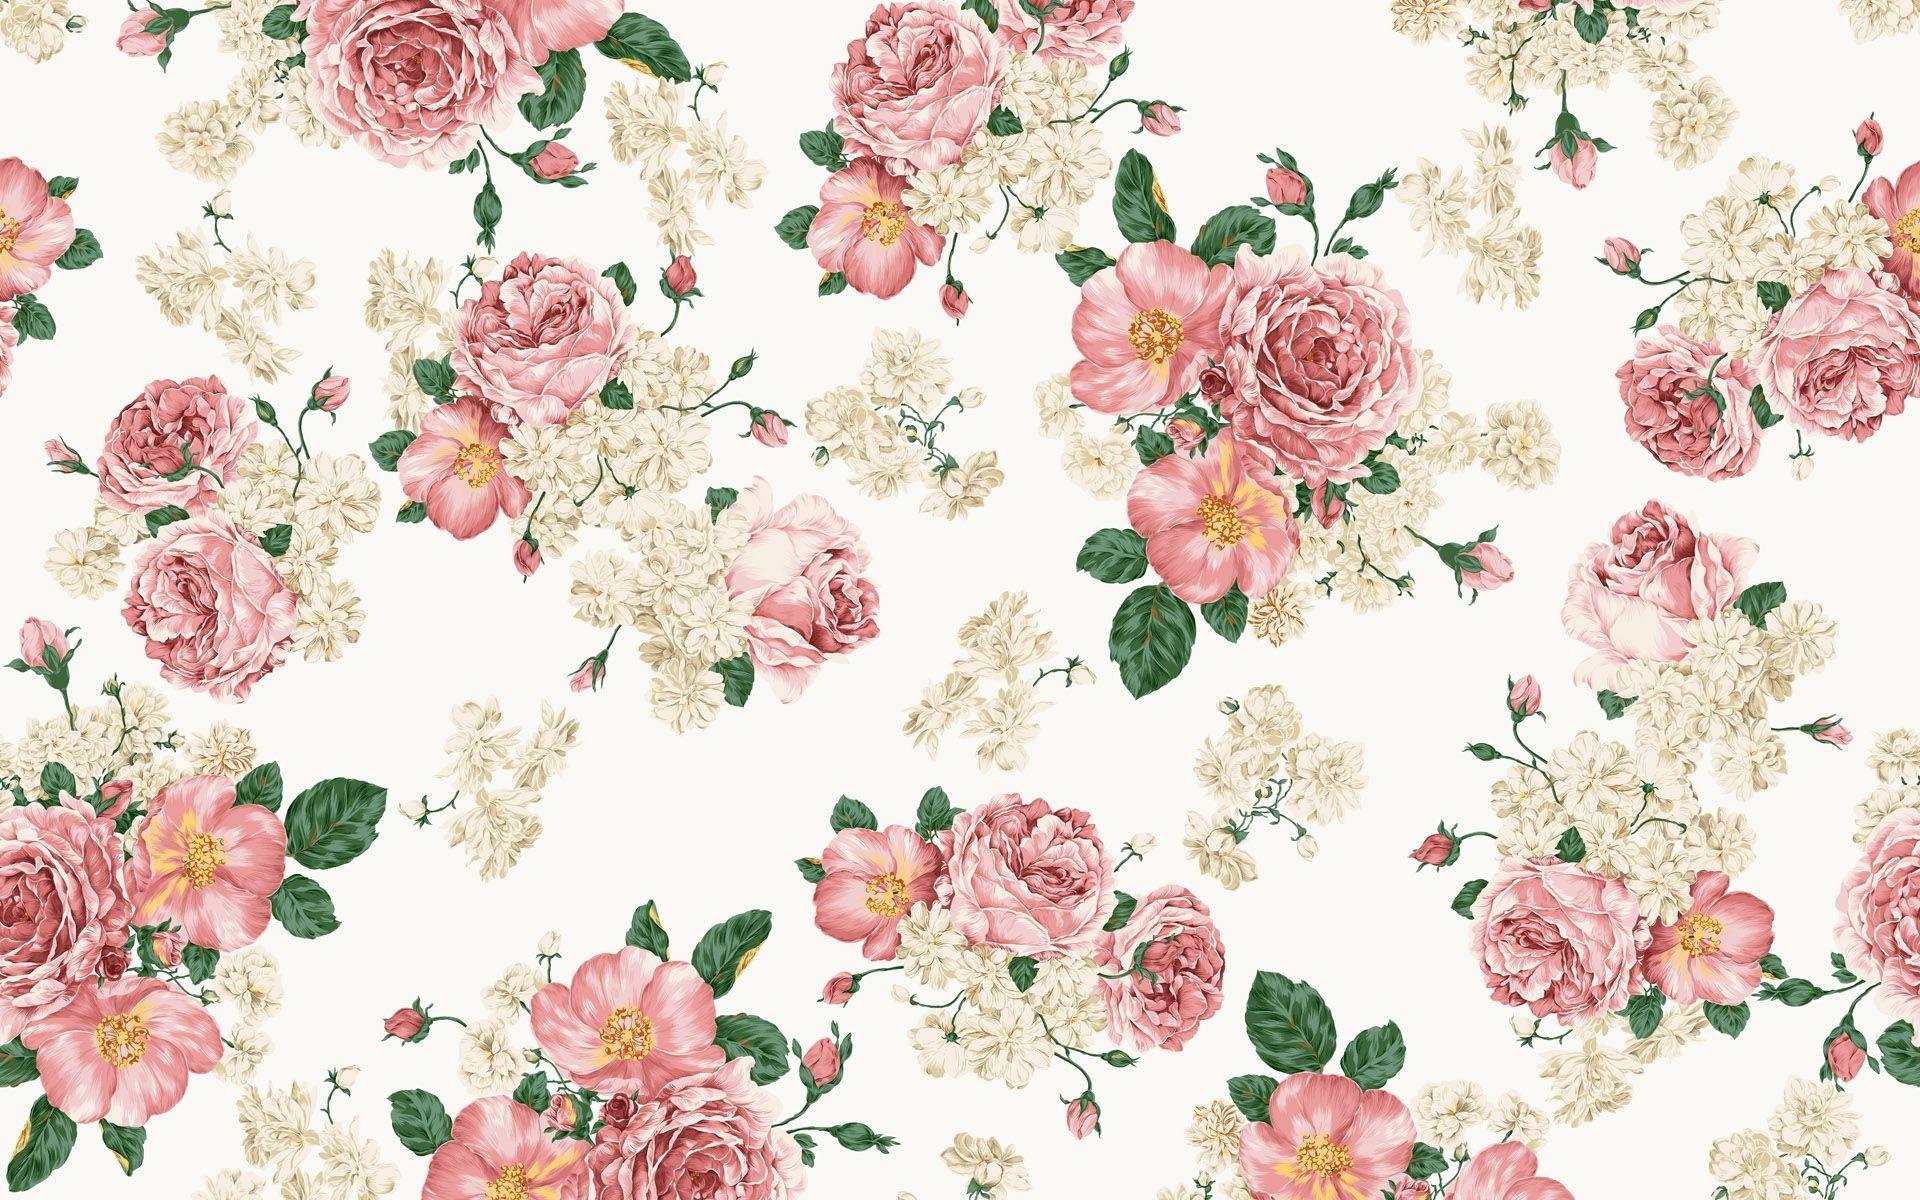 flower pattern design wallpaper high resolution with hd desktop